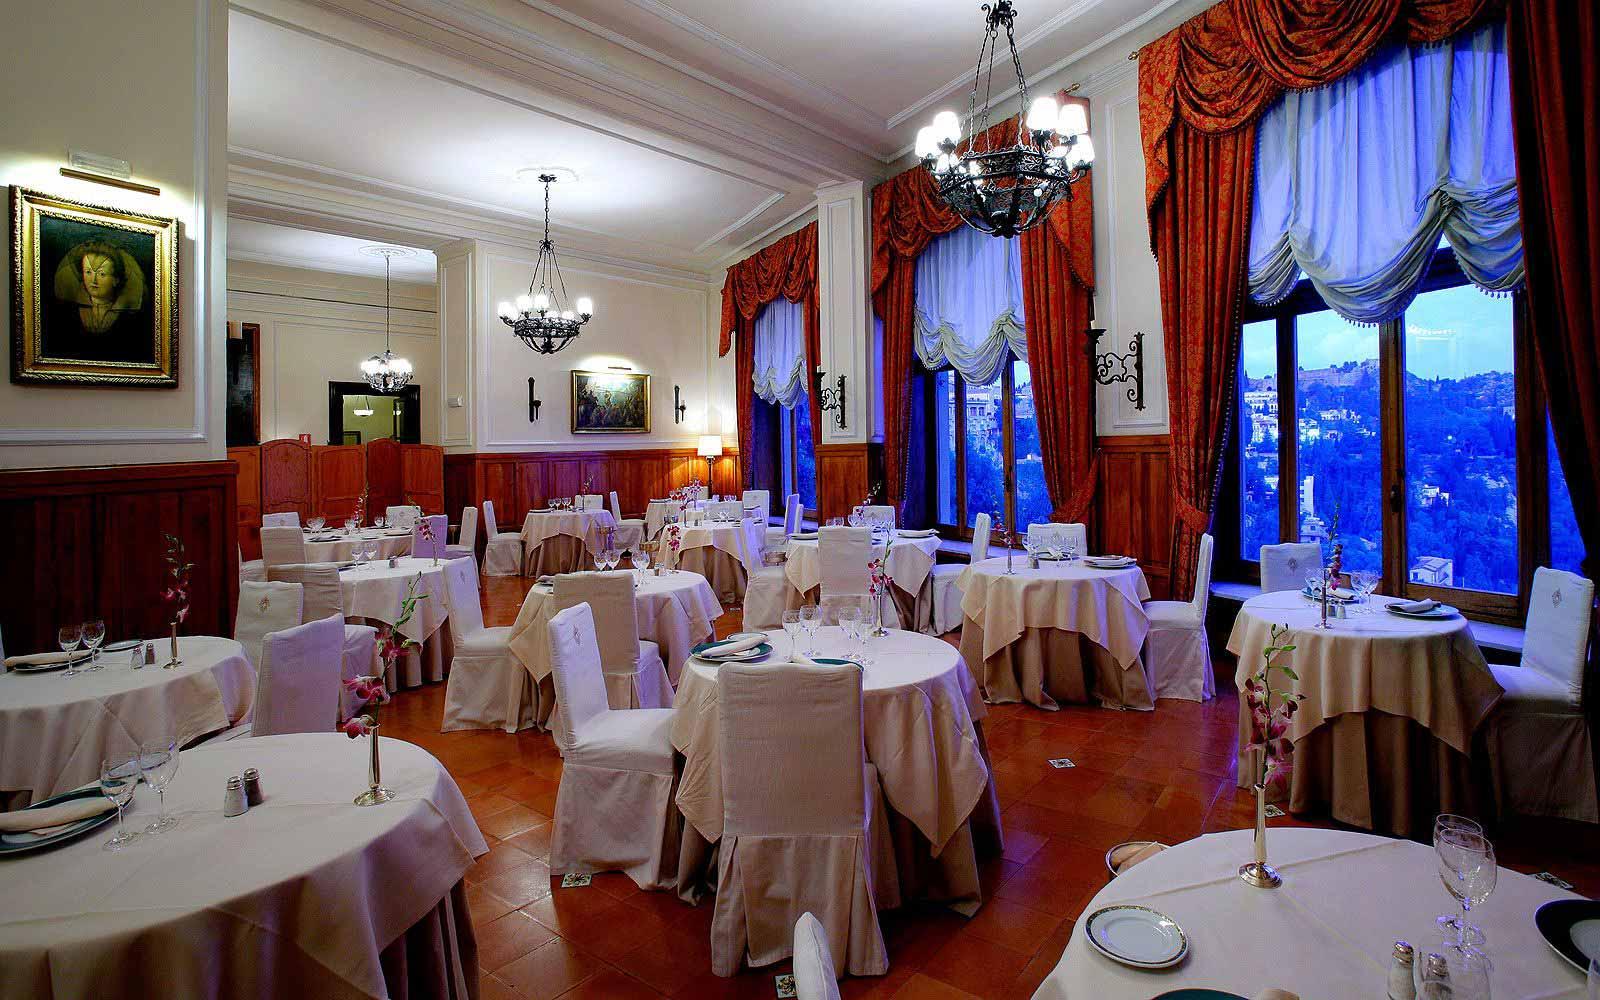 'Antico Refettorio' restaurant at the San Domenico Palace Hotel